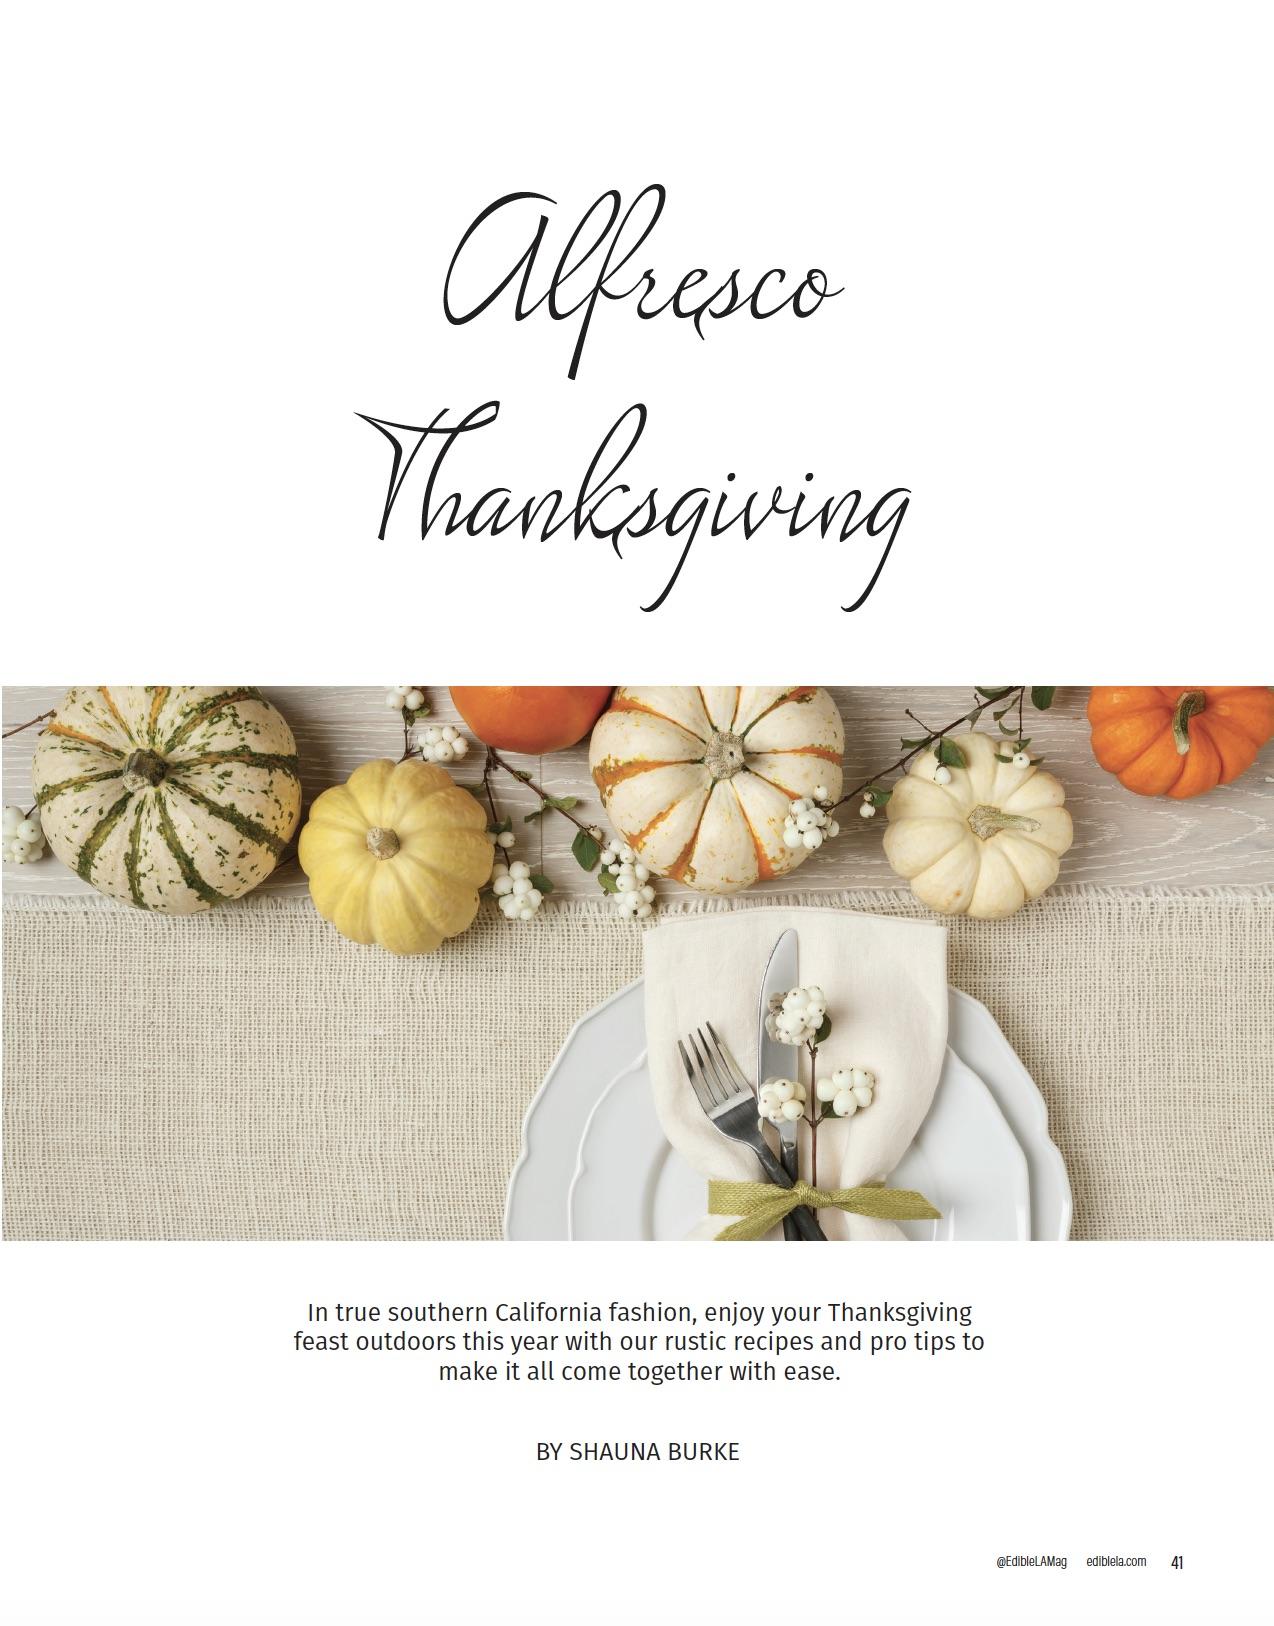 Alfresco Thanksgiving / Edible LA